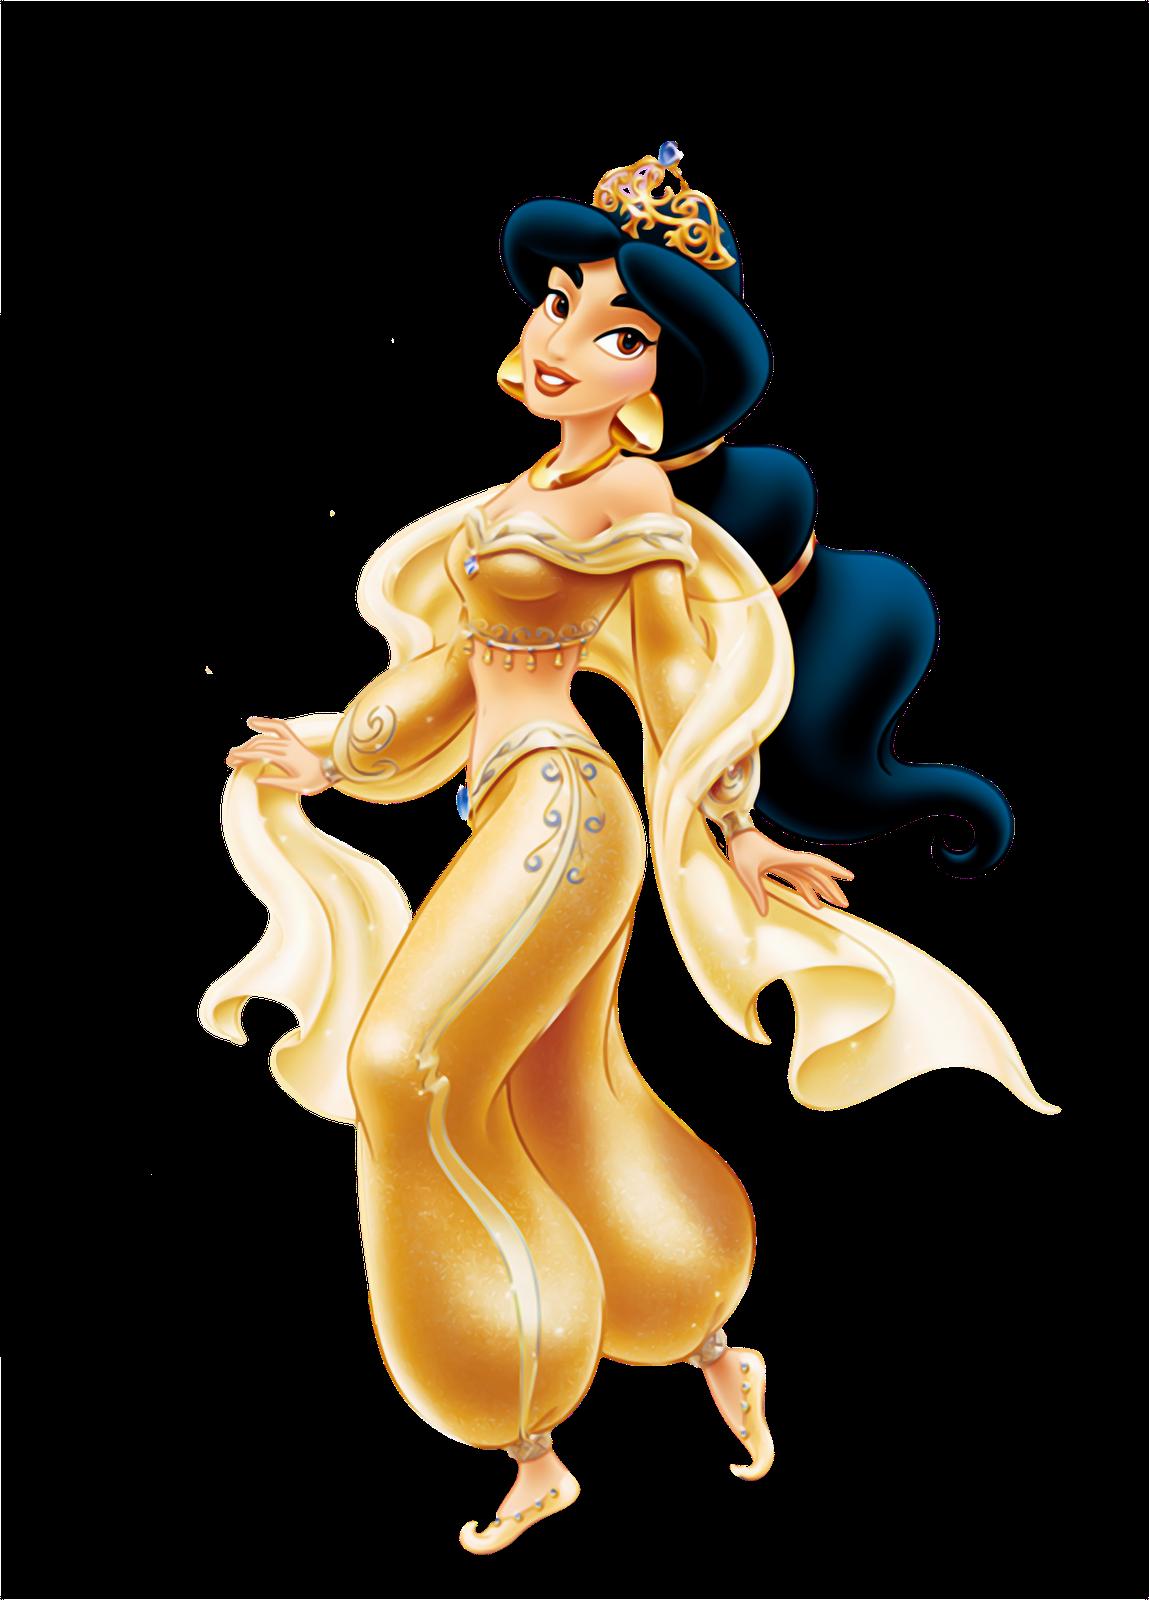 clipart princesas disney - photo #33